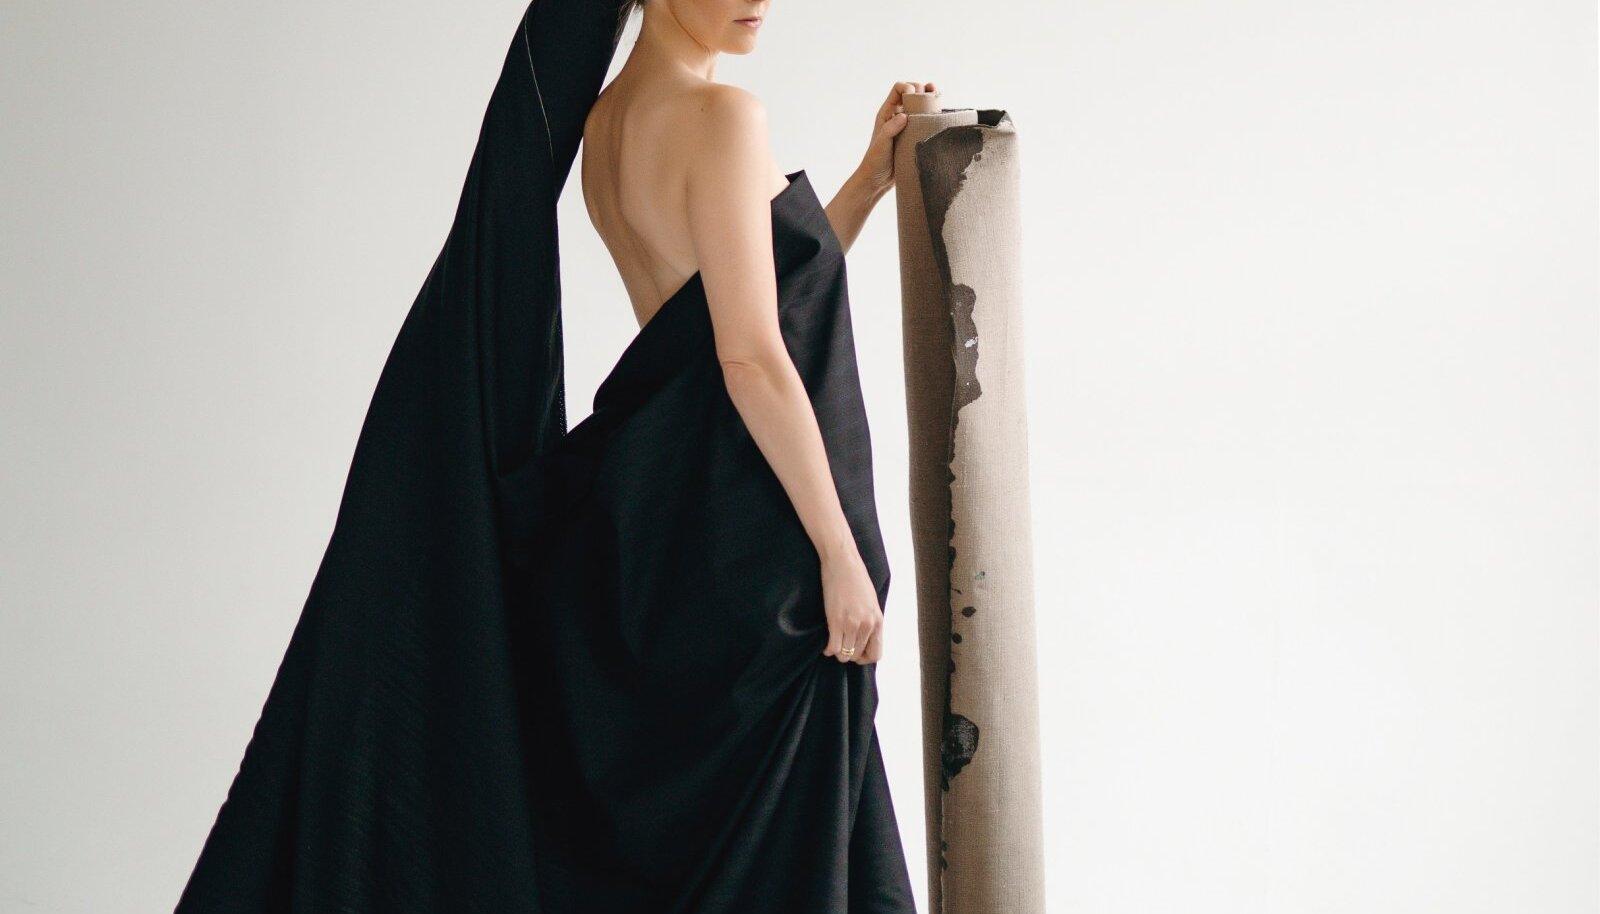 Karin Rask